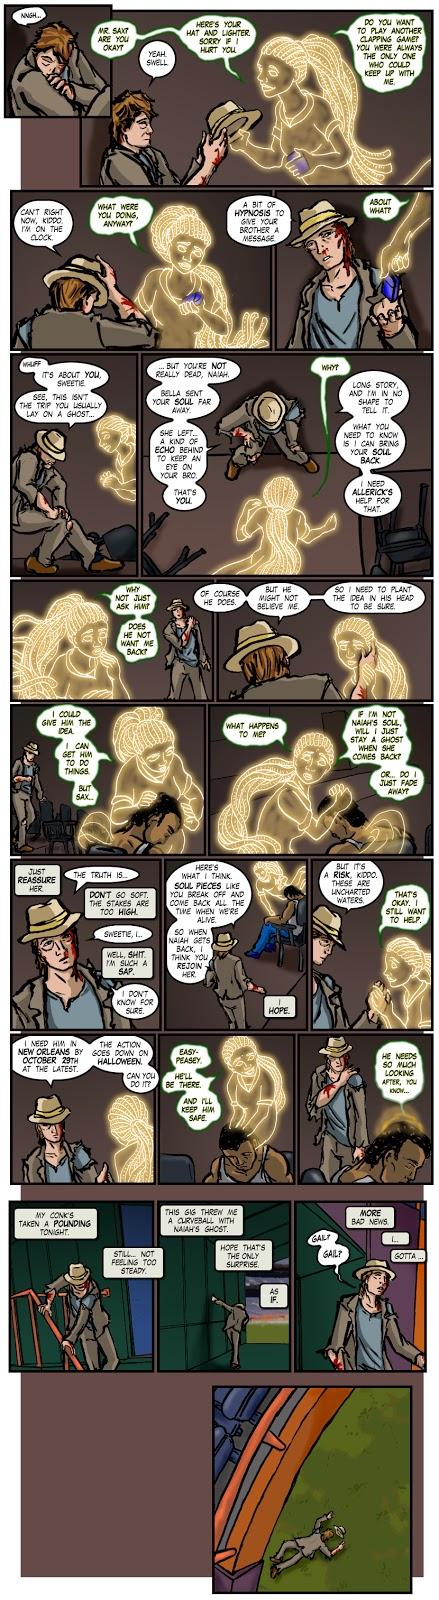 http://talesfromthevault.com/thunderstruck/comic707.html